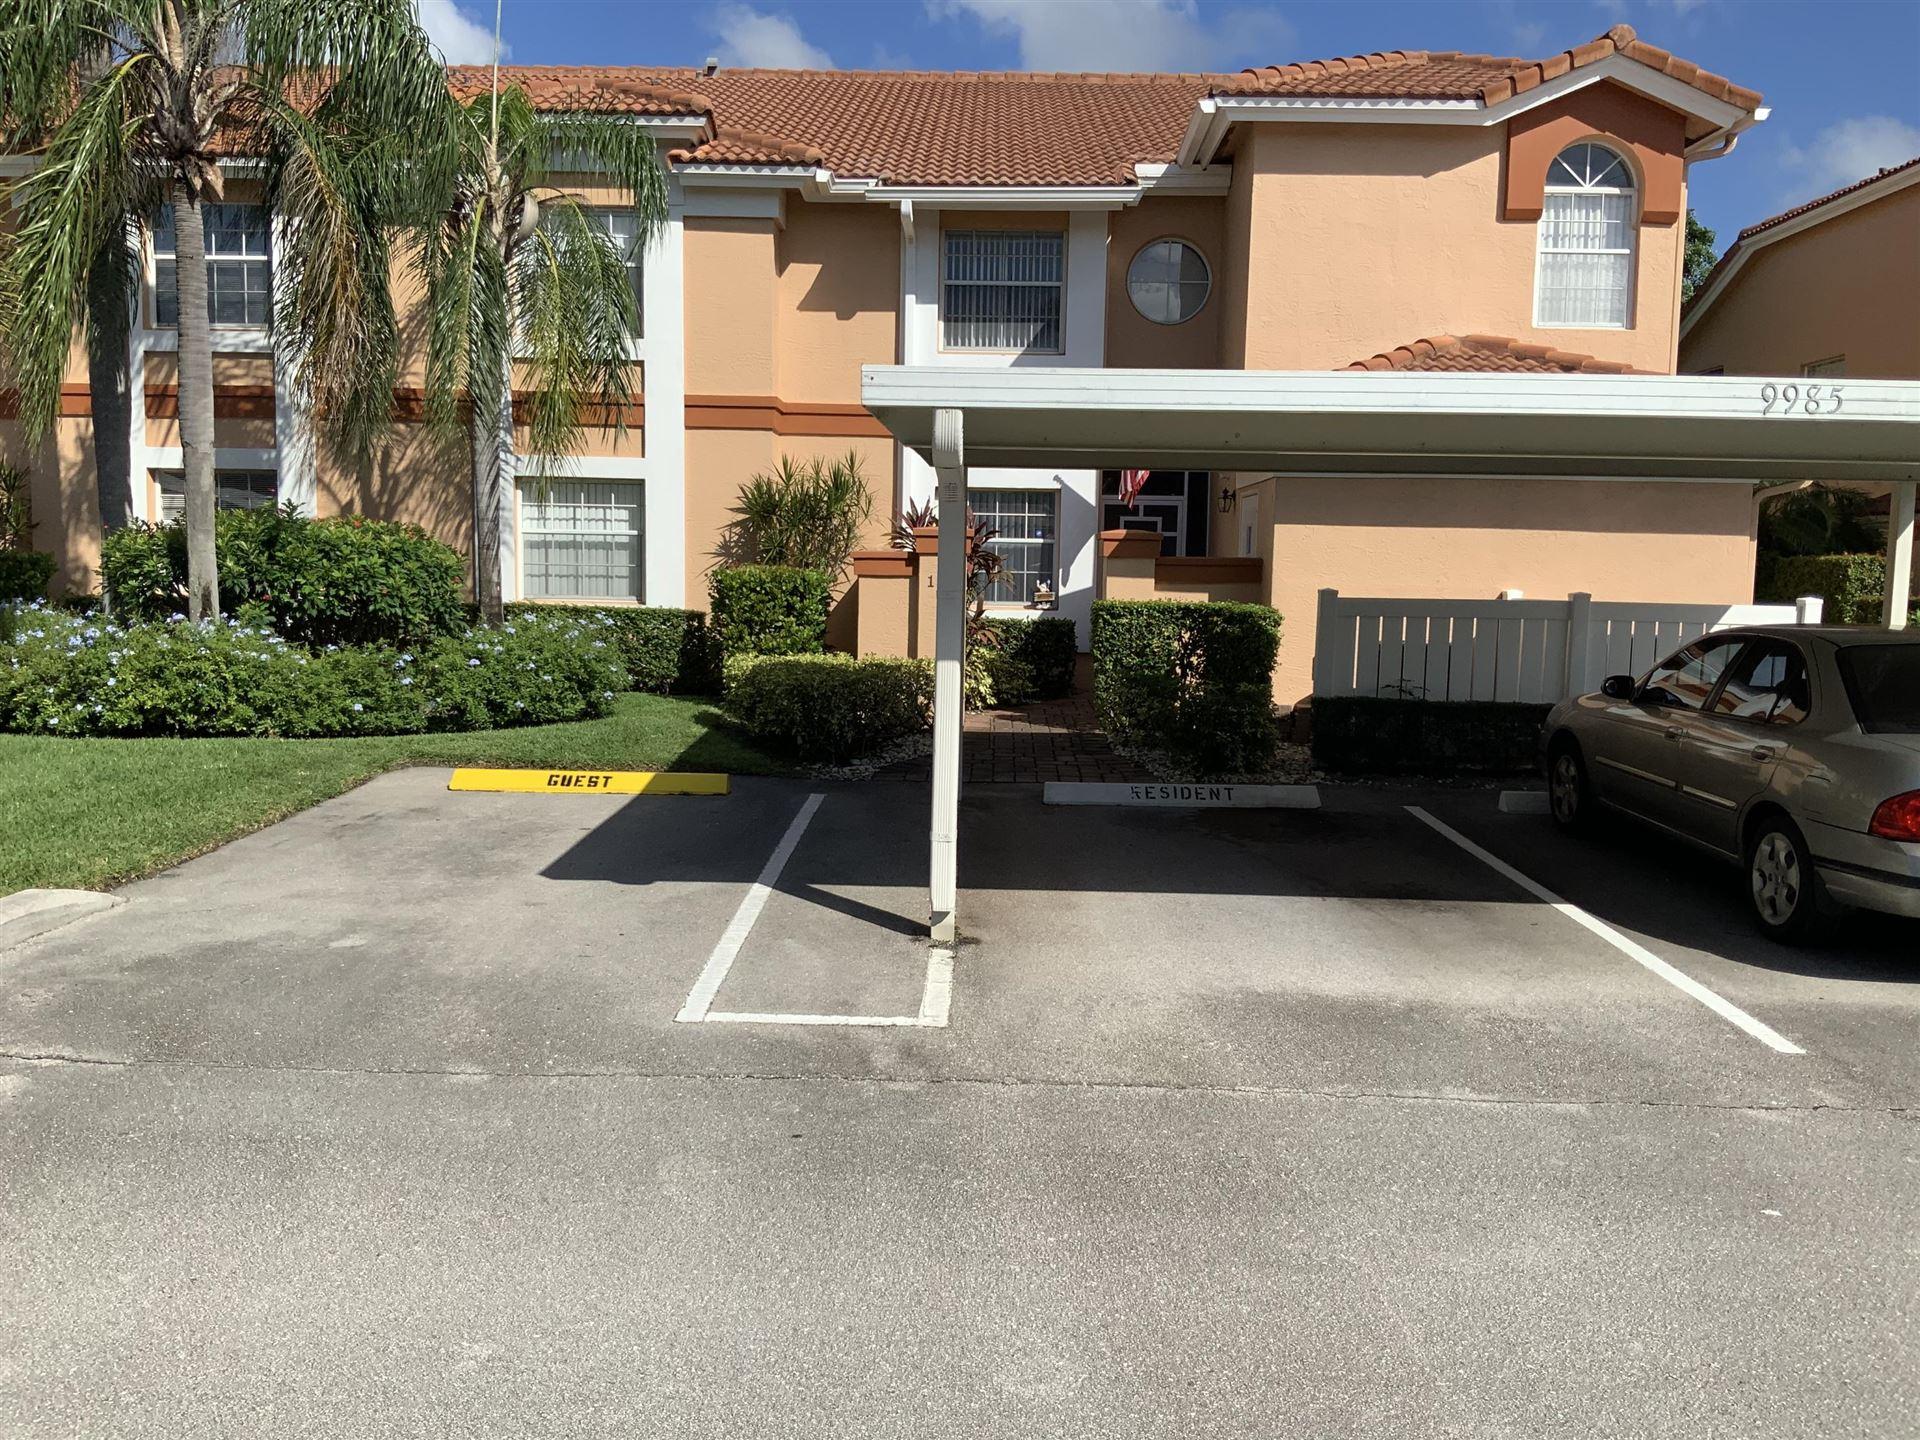 9985 Harbour Lake Circle #102, Boynton Beach, FL 33437 - #: RX-10666785